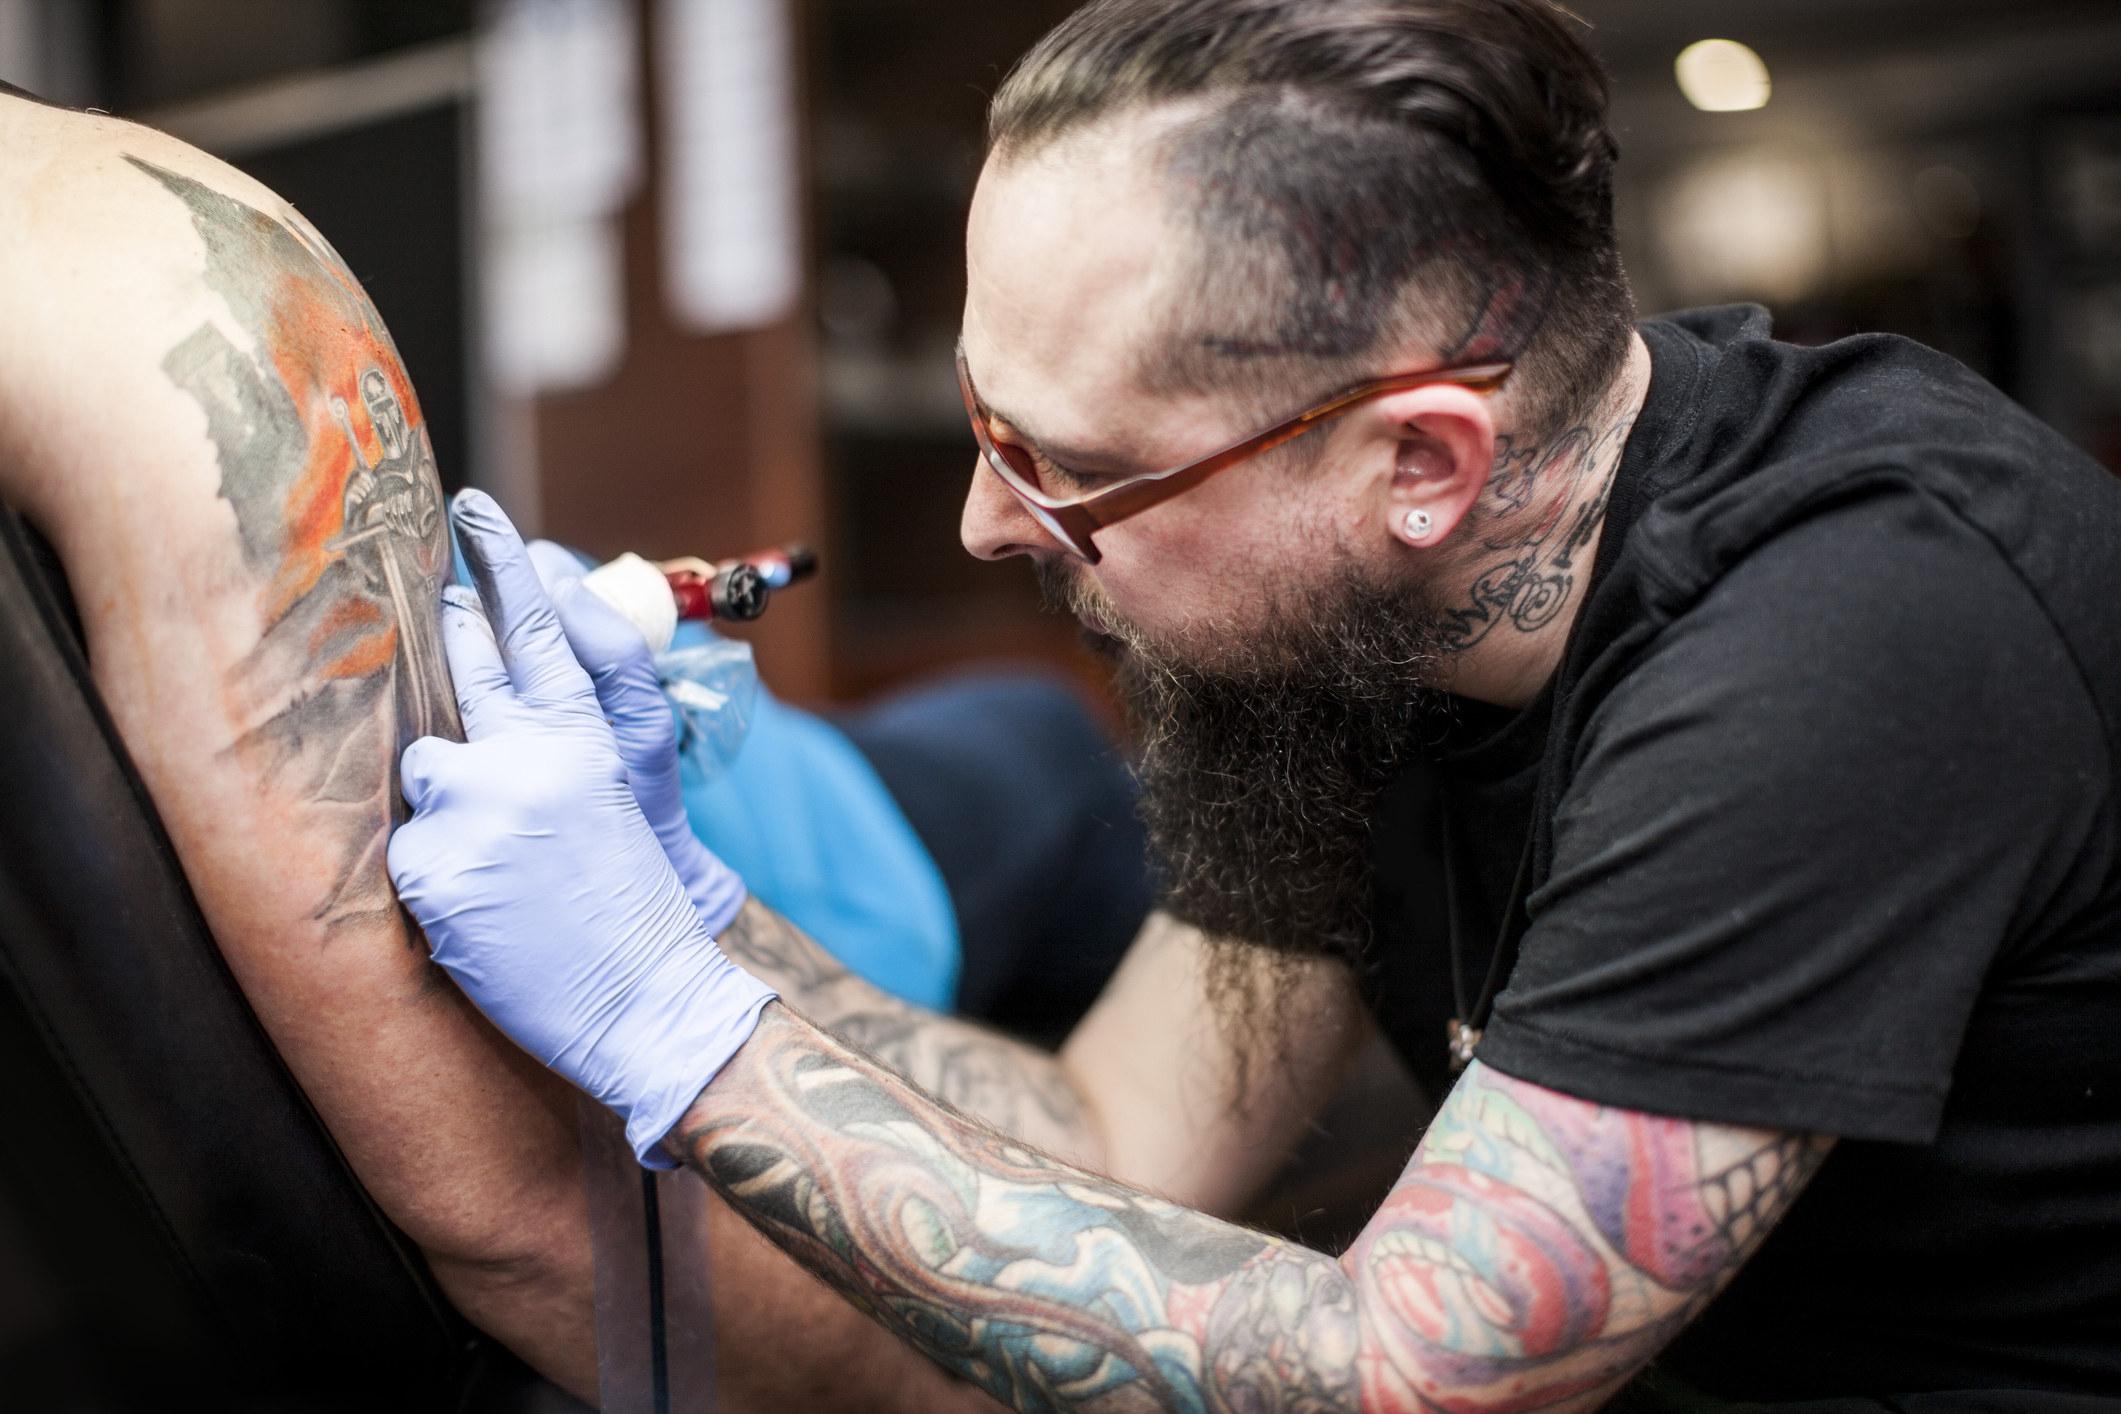 a tattoo artist working on an arm